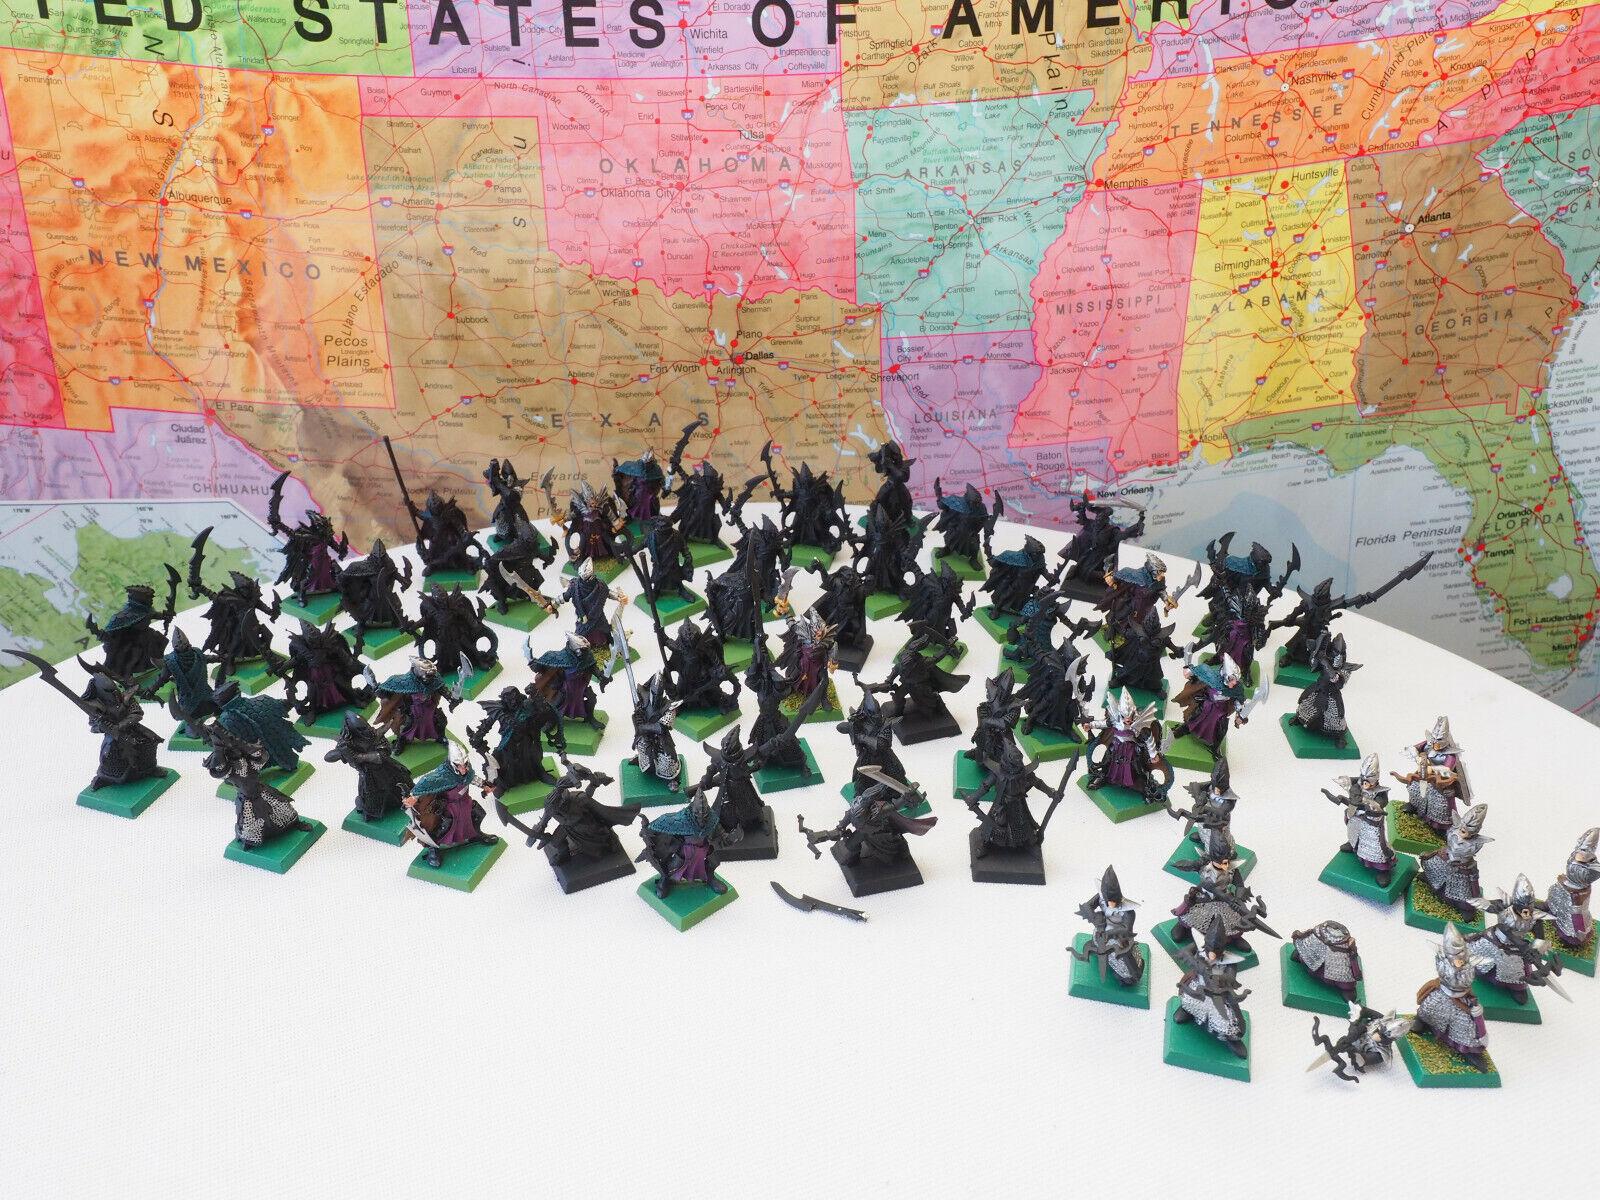 Warhammer 40k Figures 56 Metal + 11 Plastic Figures 67 Total